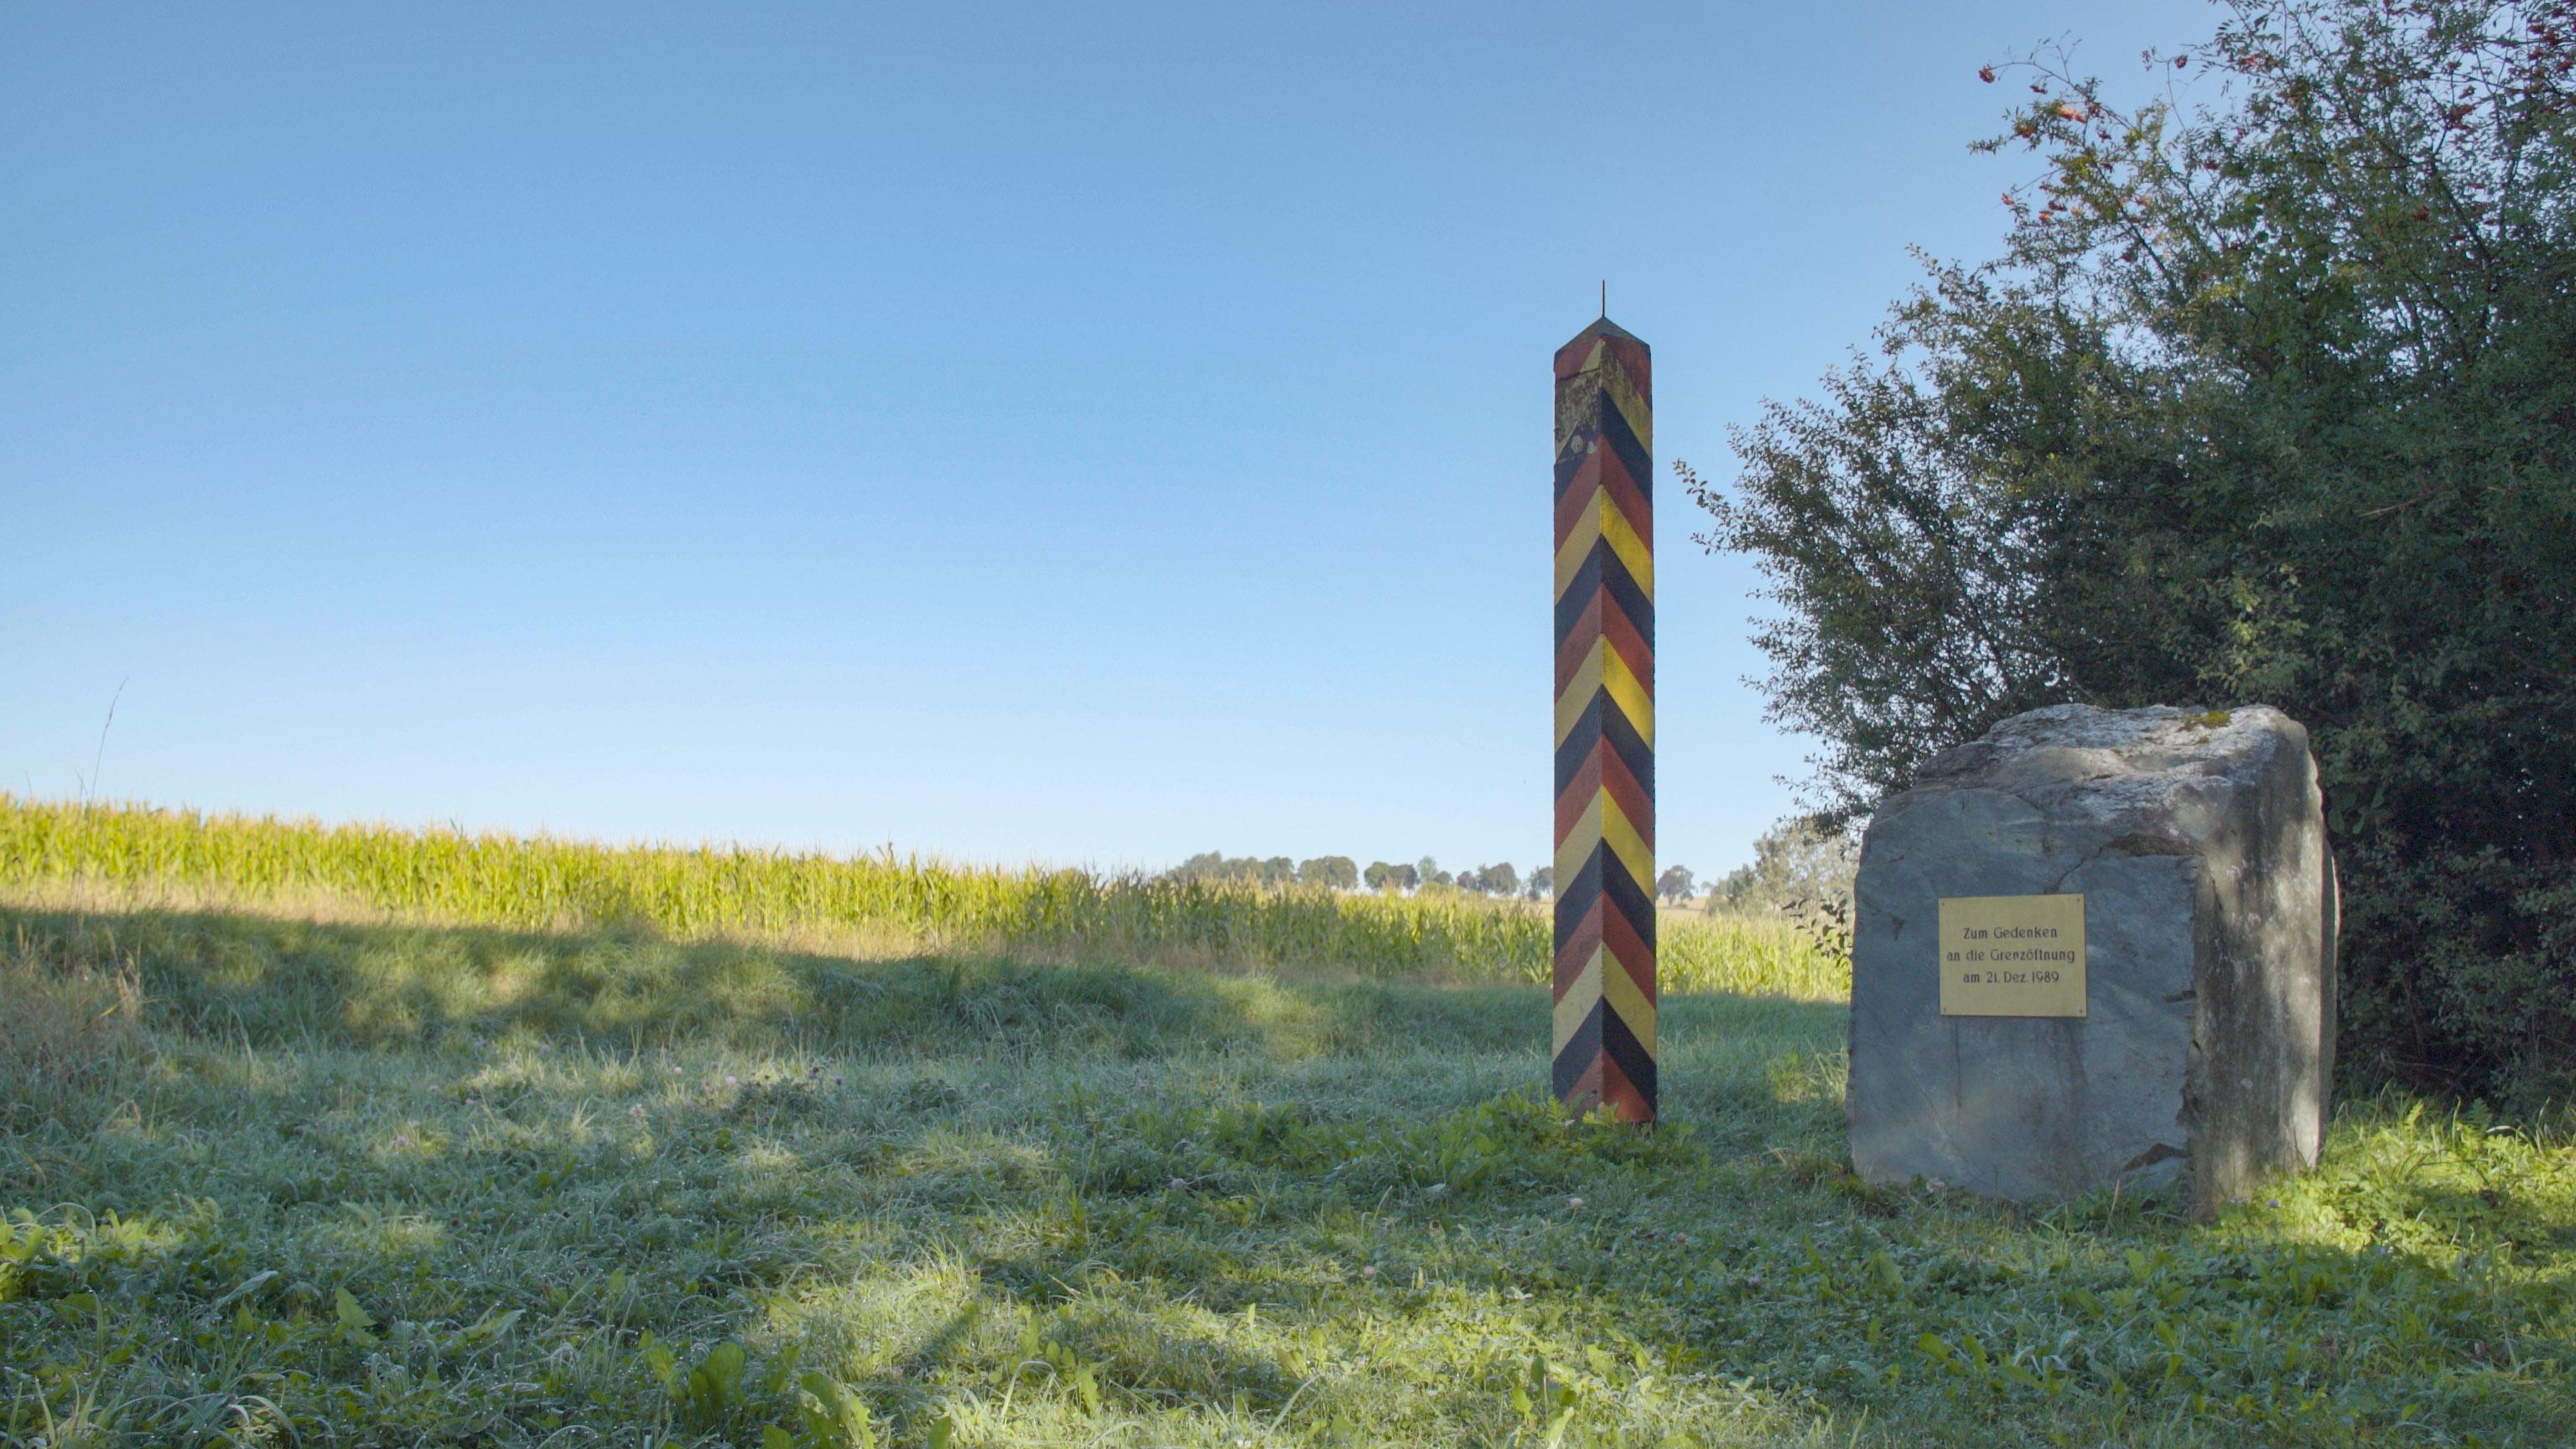 Green Belt border post - long distance hiking - hiking trails Germany - hiking in Germany - top trails in Germany